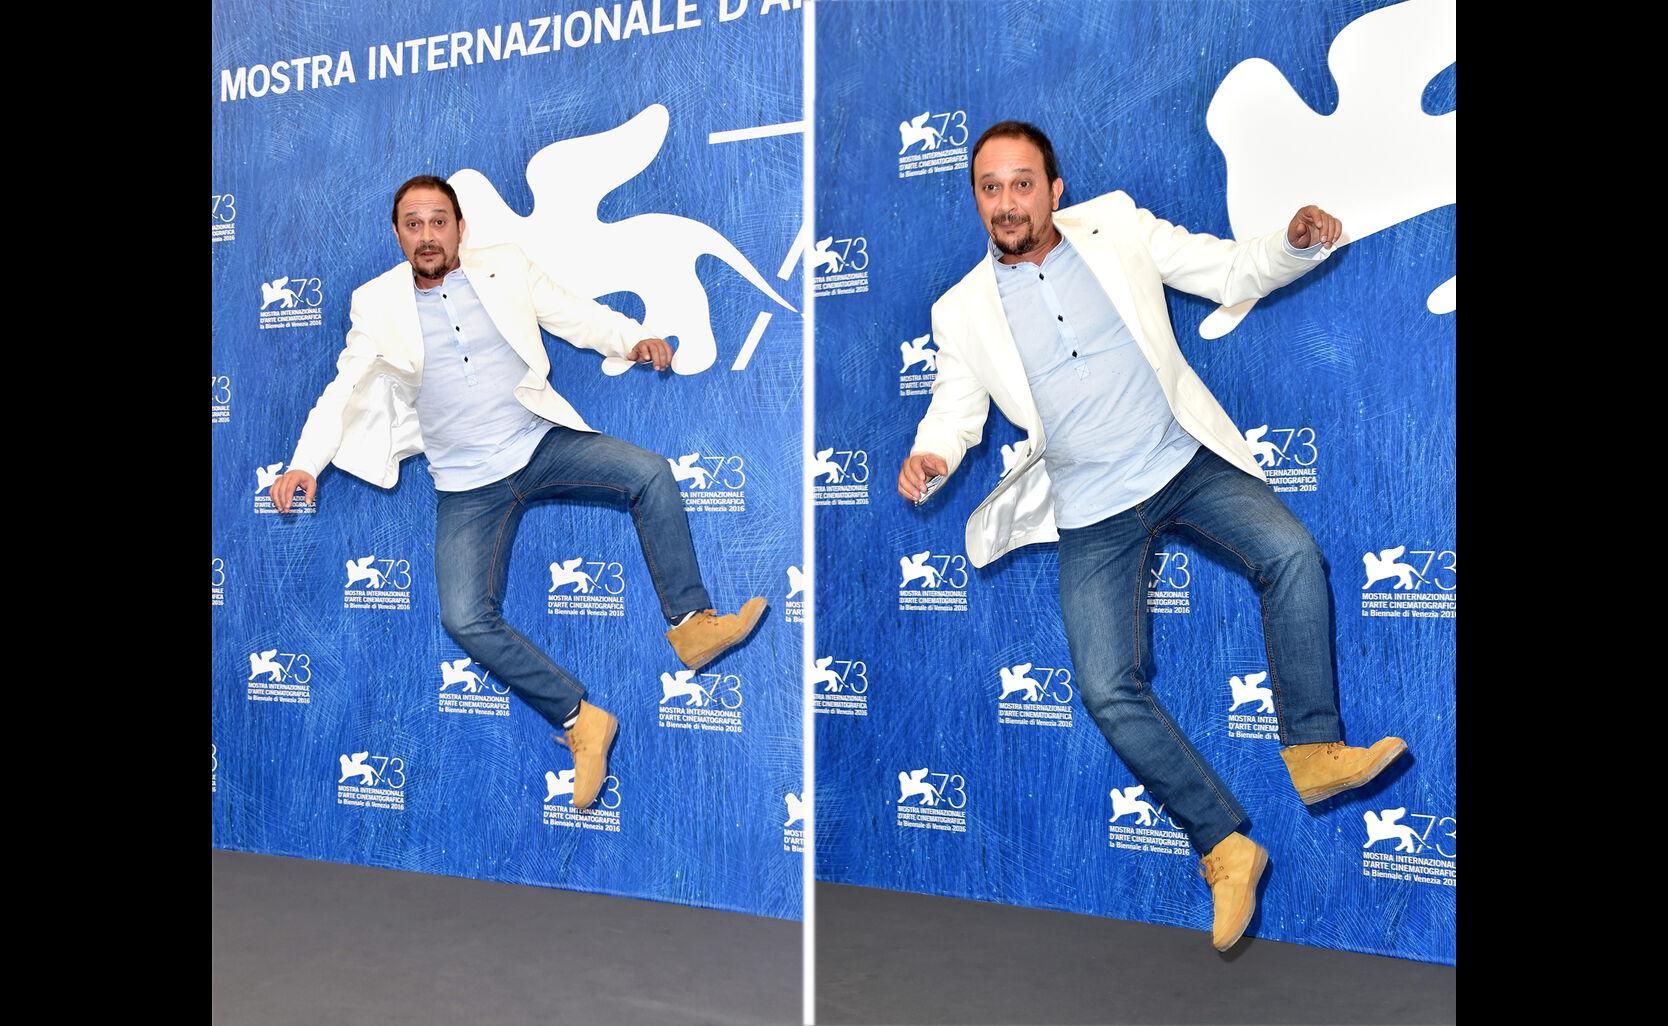 Luis Callejo at 2016 Venice Film Festival